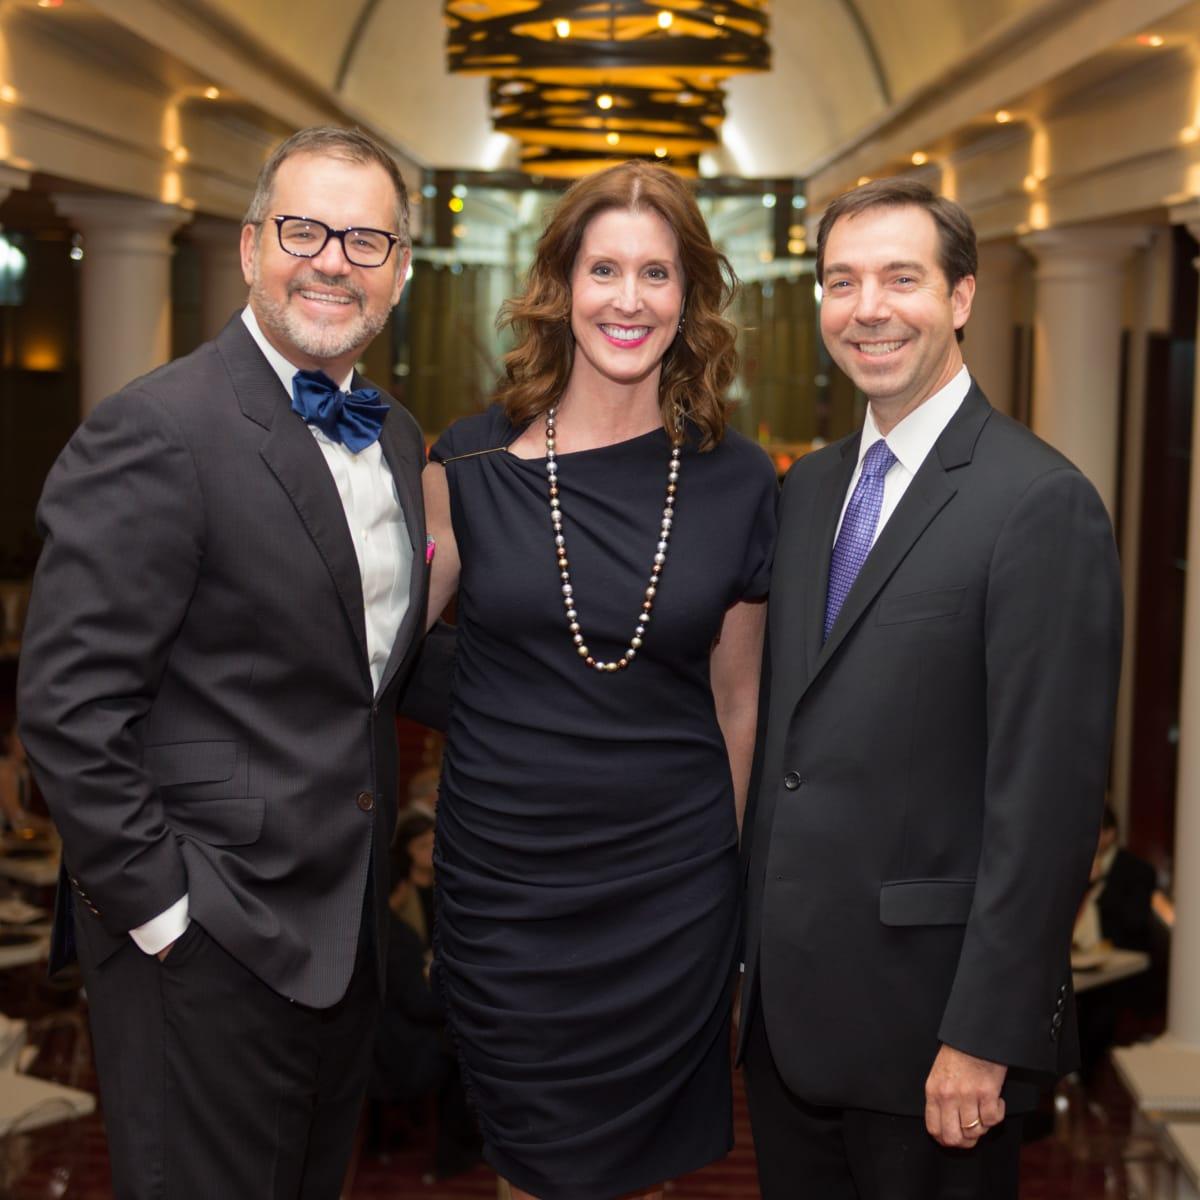 News, Shelby, Wortham Center Founder's Salon, Sept. 2015, Todd Fiscus, Phoebe Tudor, Jim Nelson